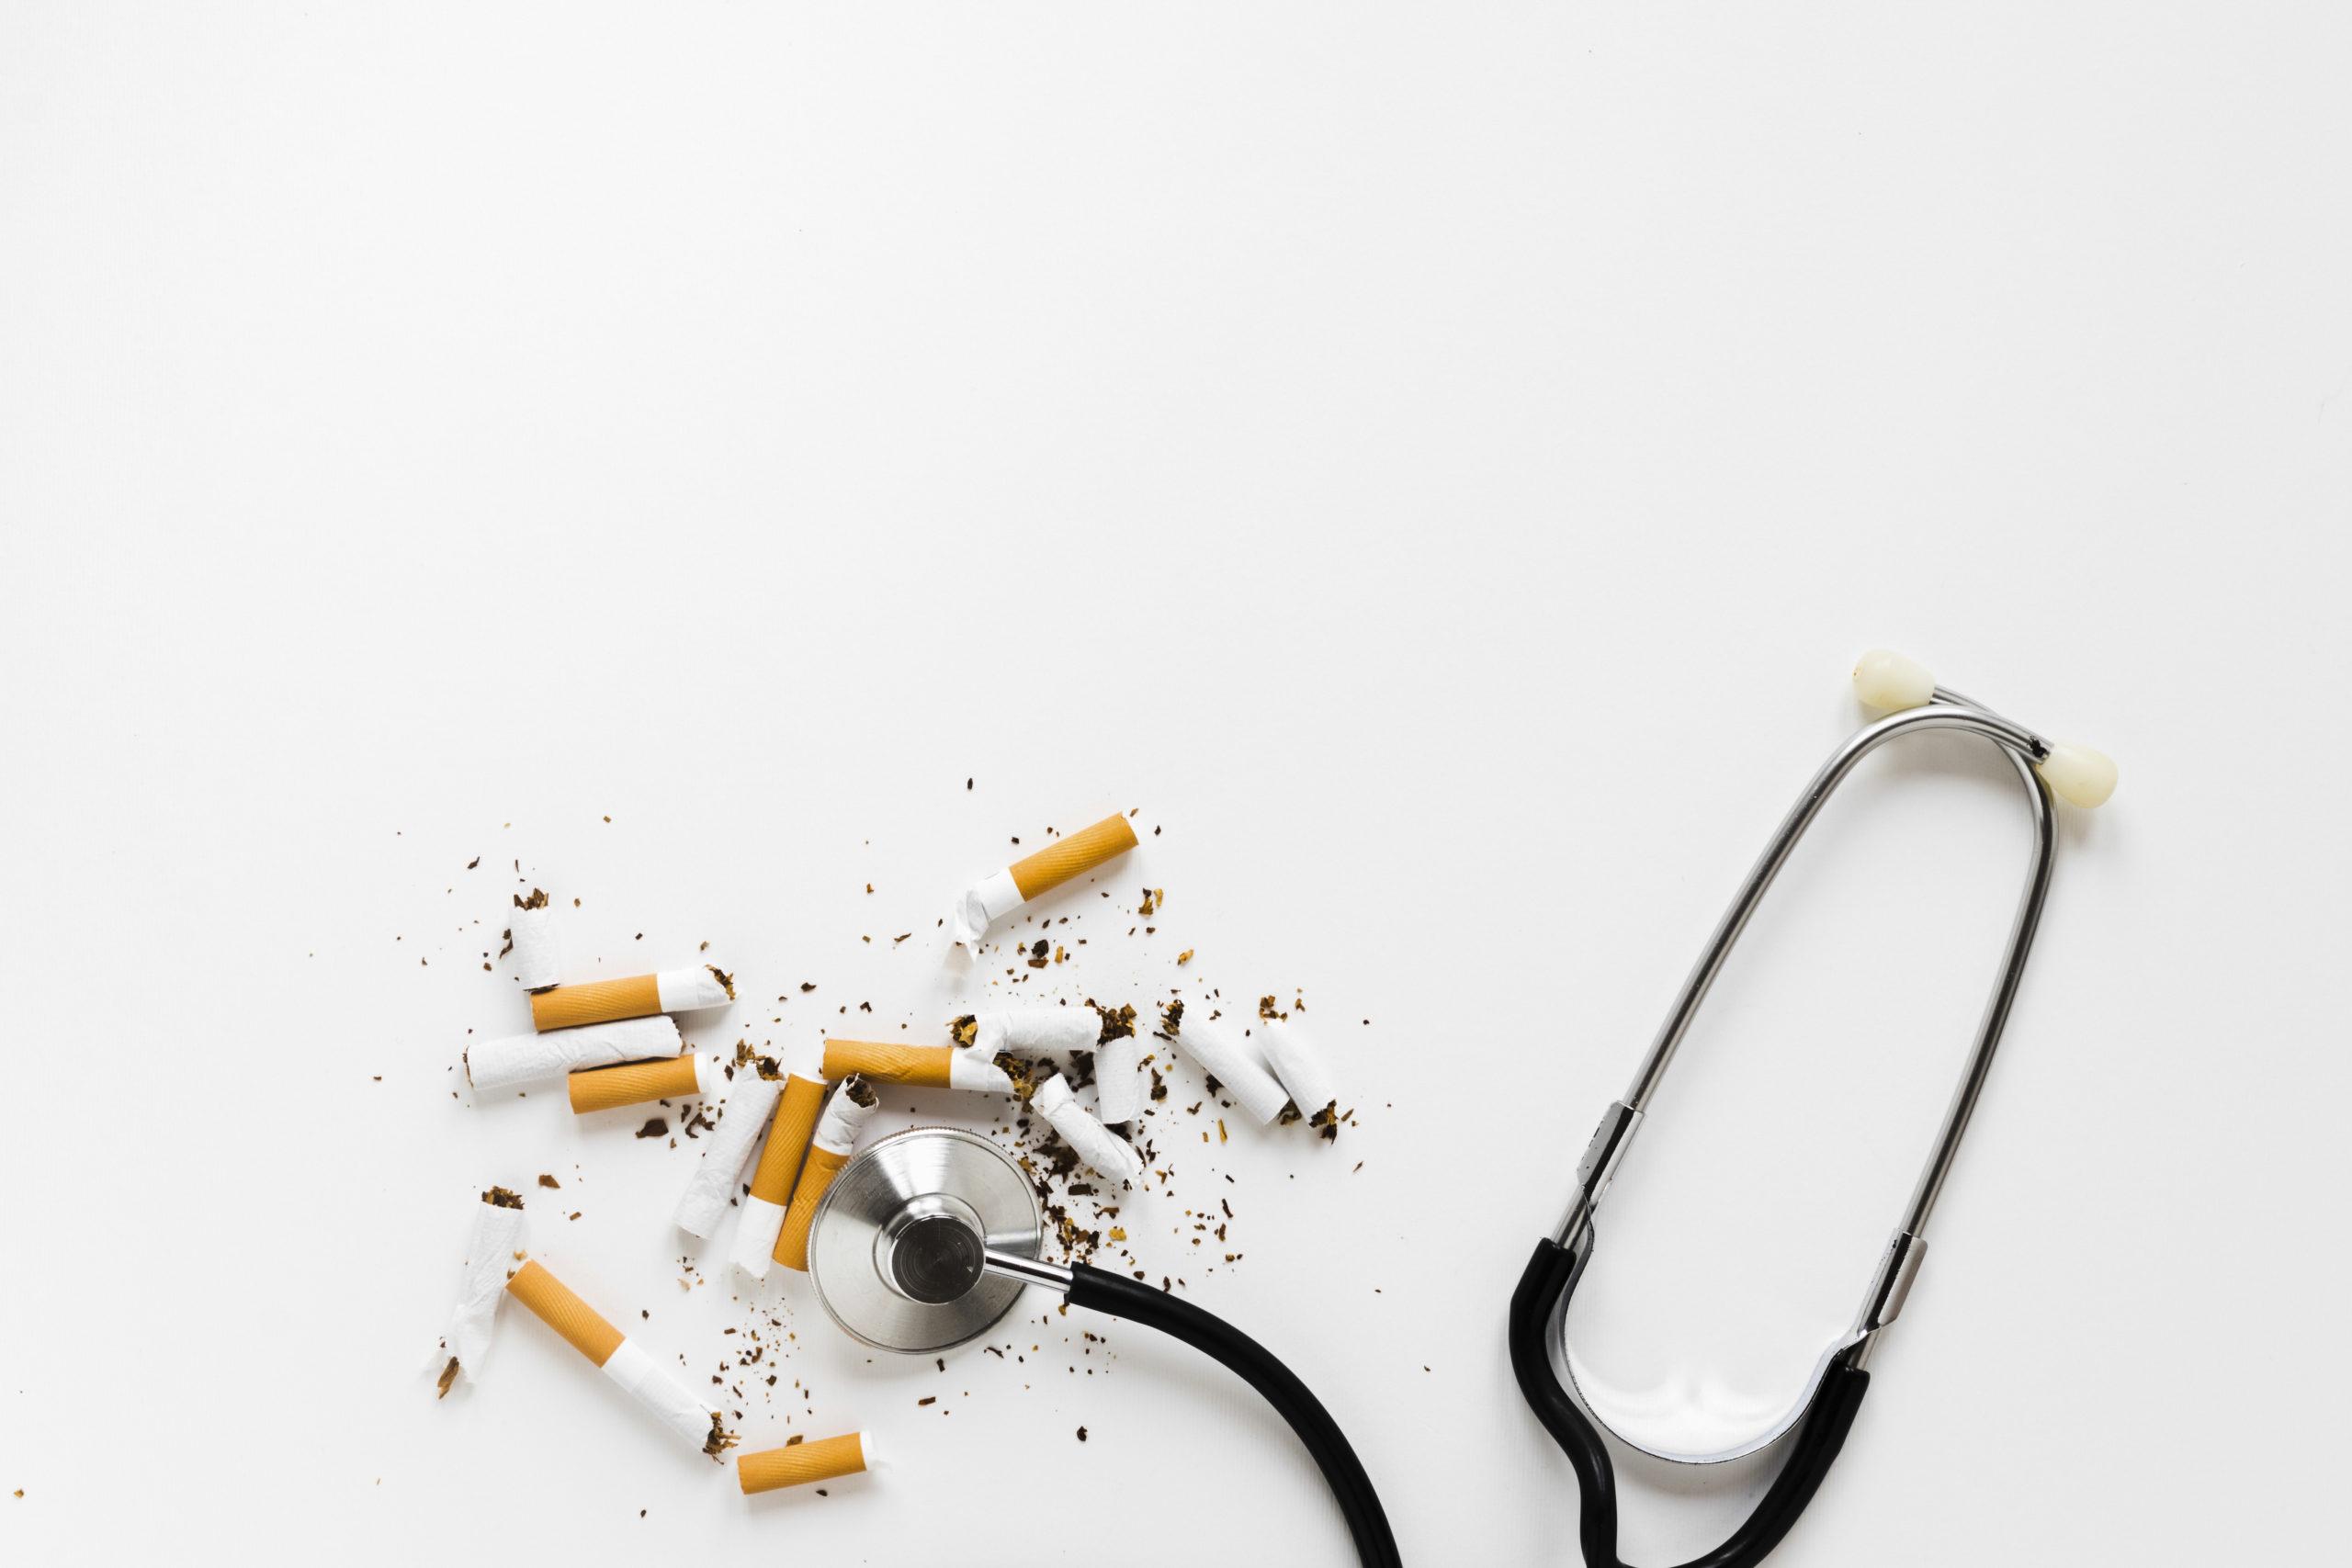 neumologo privado, cancer de pulmon